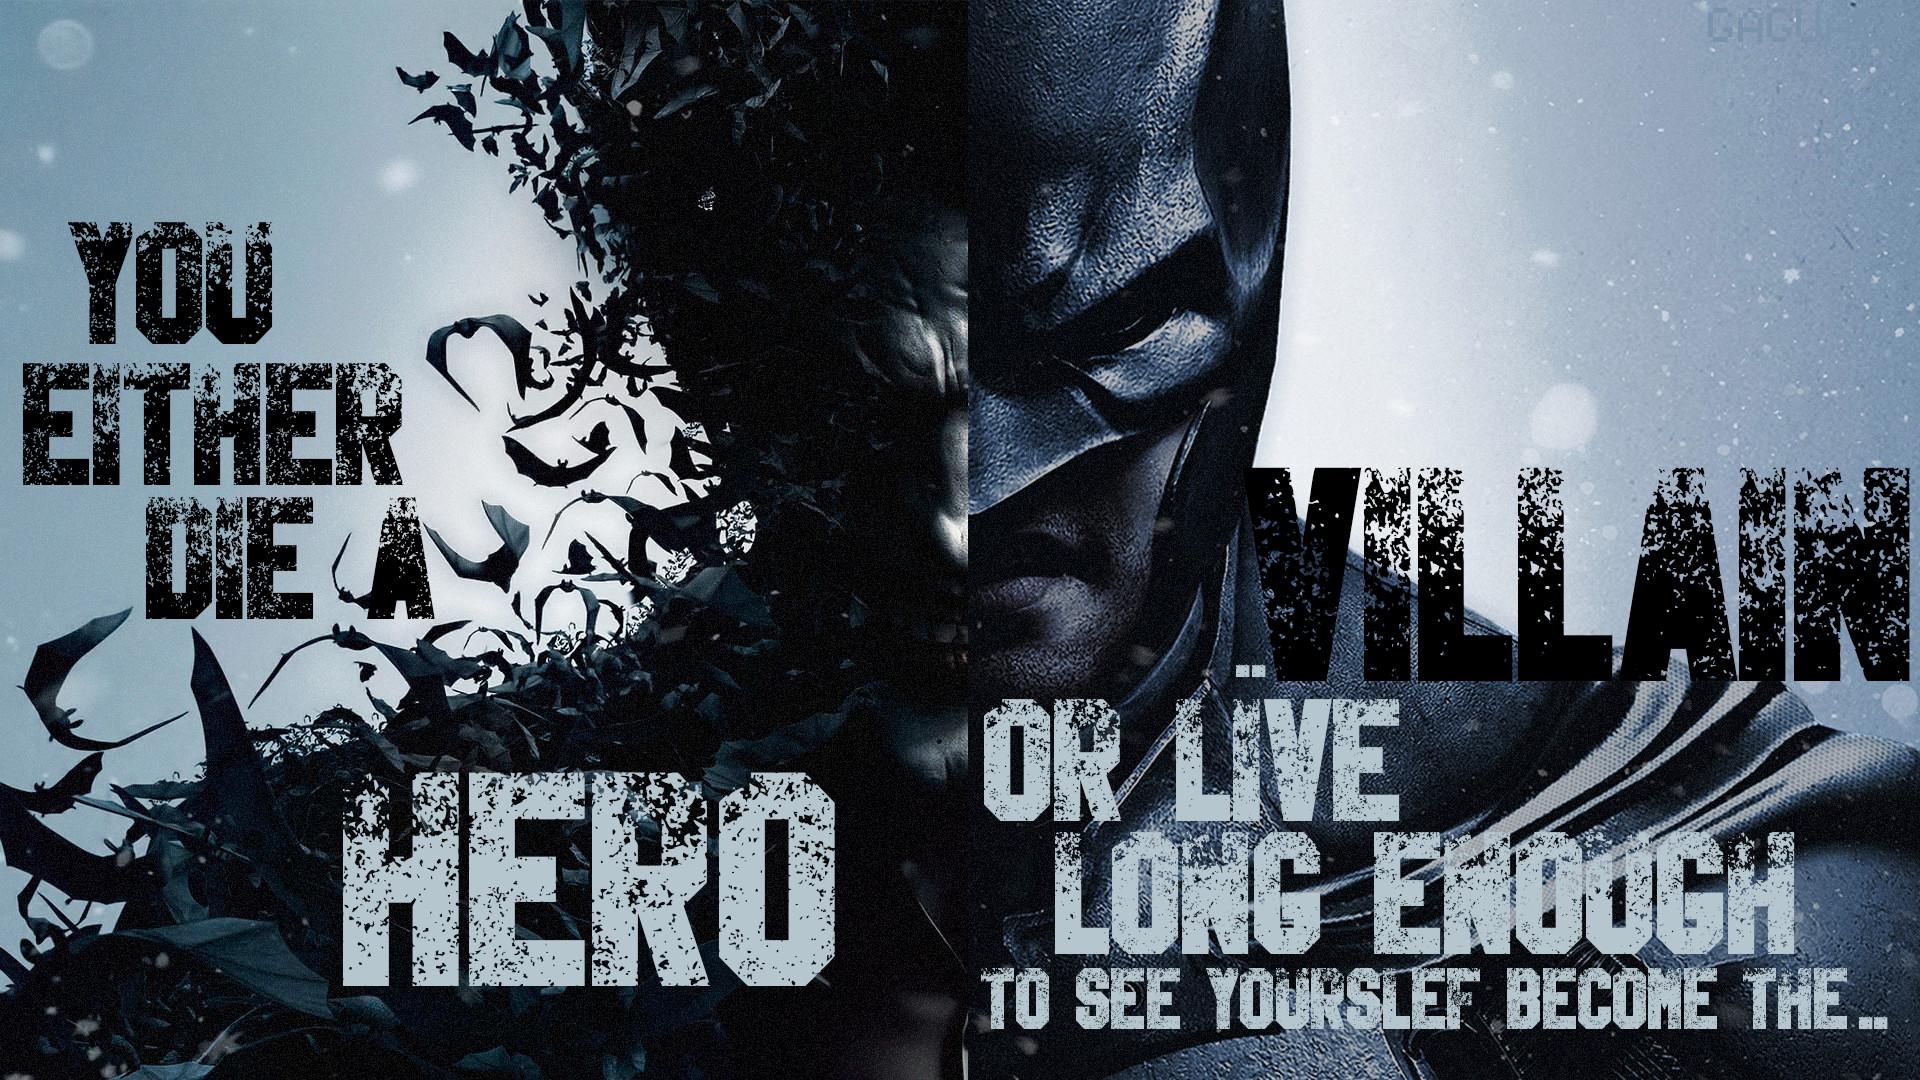 Batman vs Joker Wallpaper (73+ images)